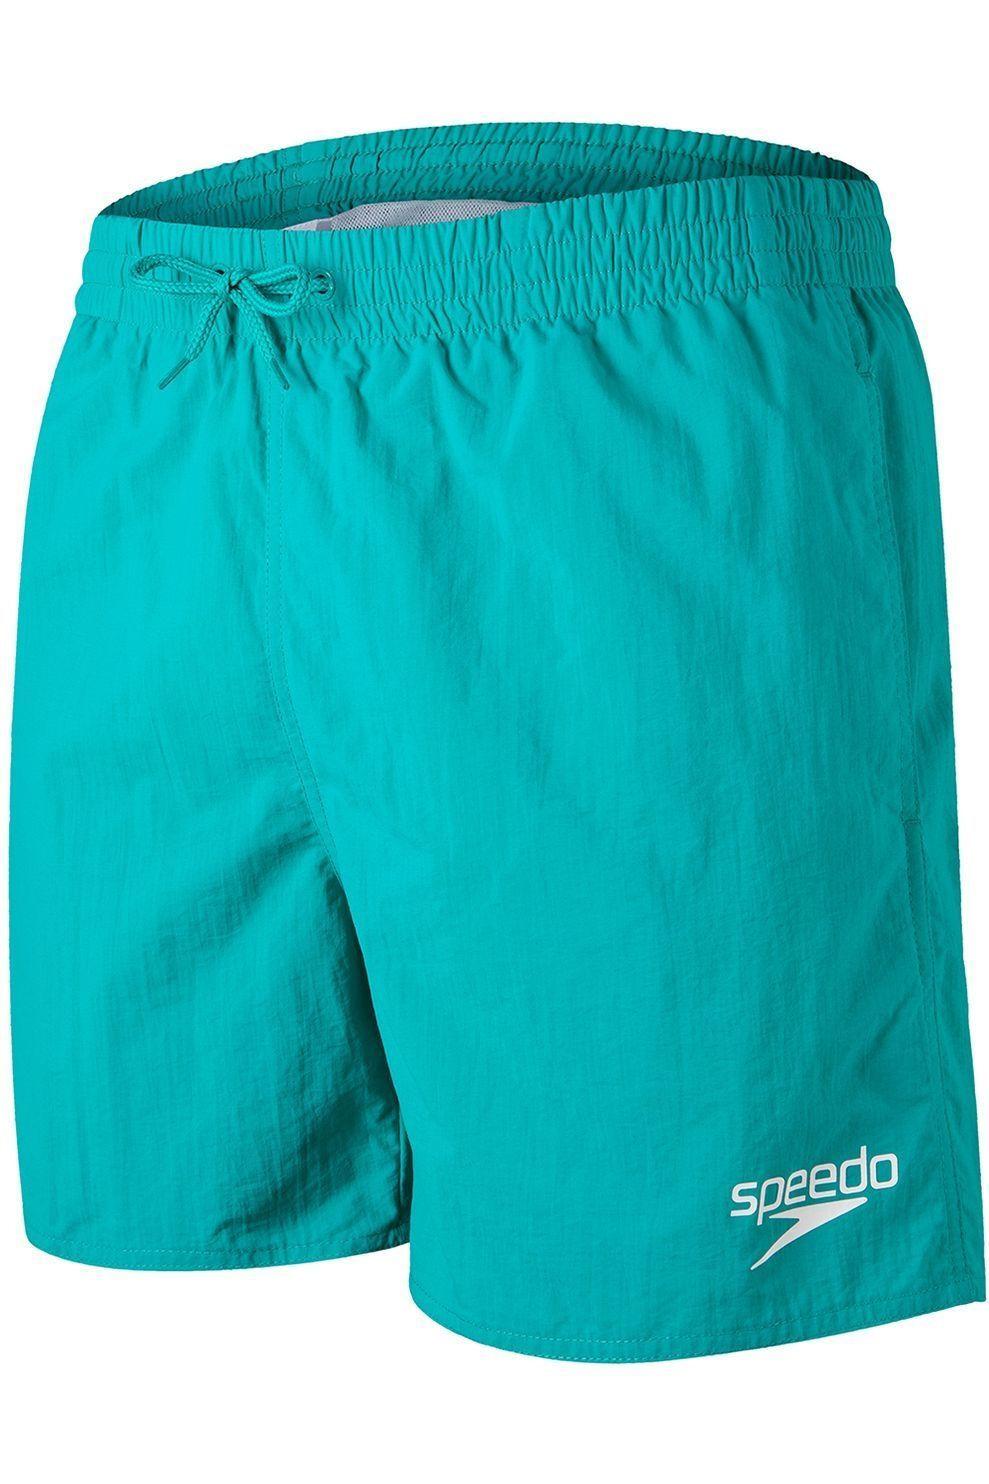 Speedo Zwemshort Essentials 16 voor heren - Blauw - Maten: S, M, L, XL, XXL